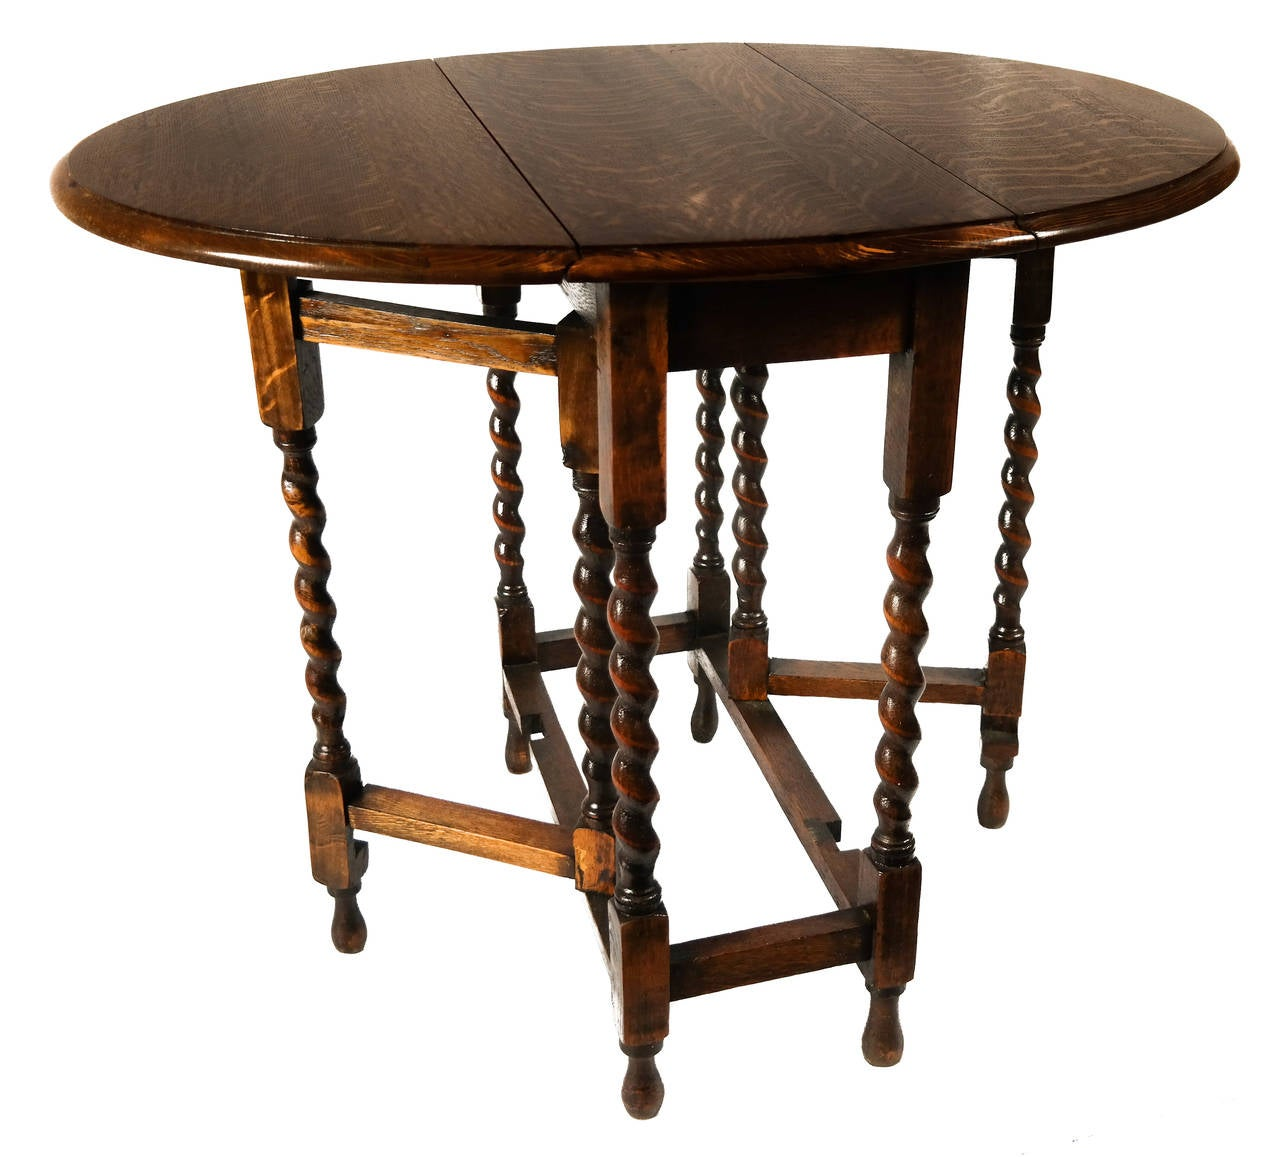 Gateleg table at 1stdibs - Gateleg table and chairs ...